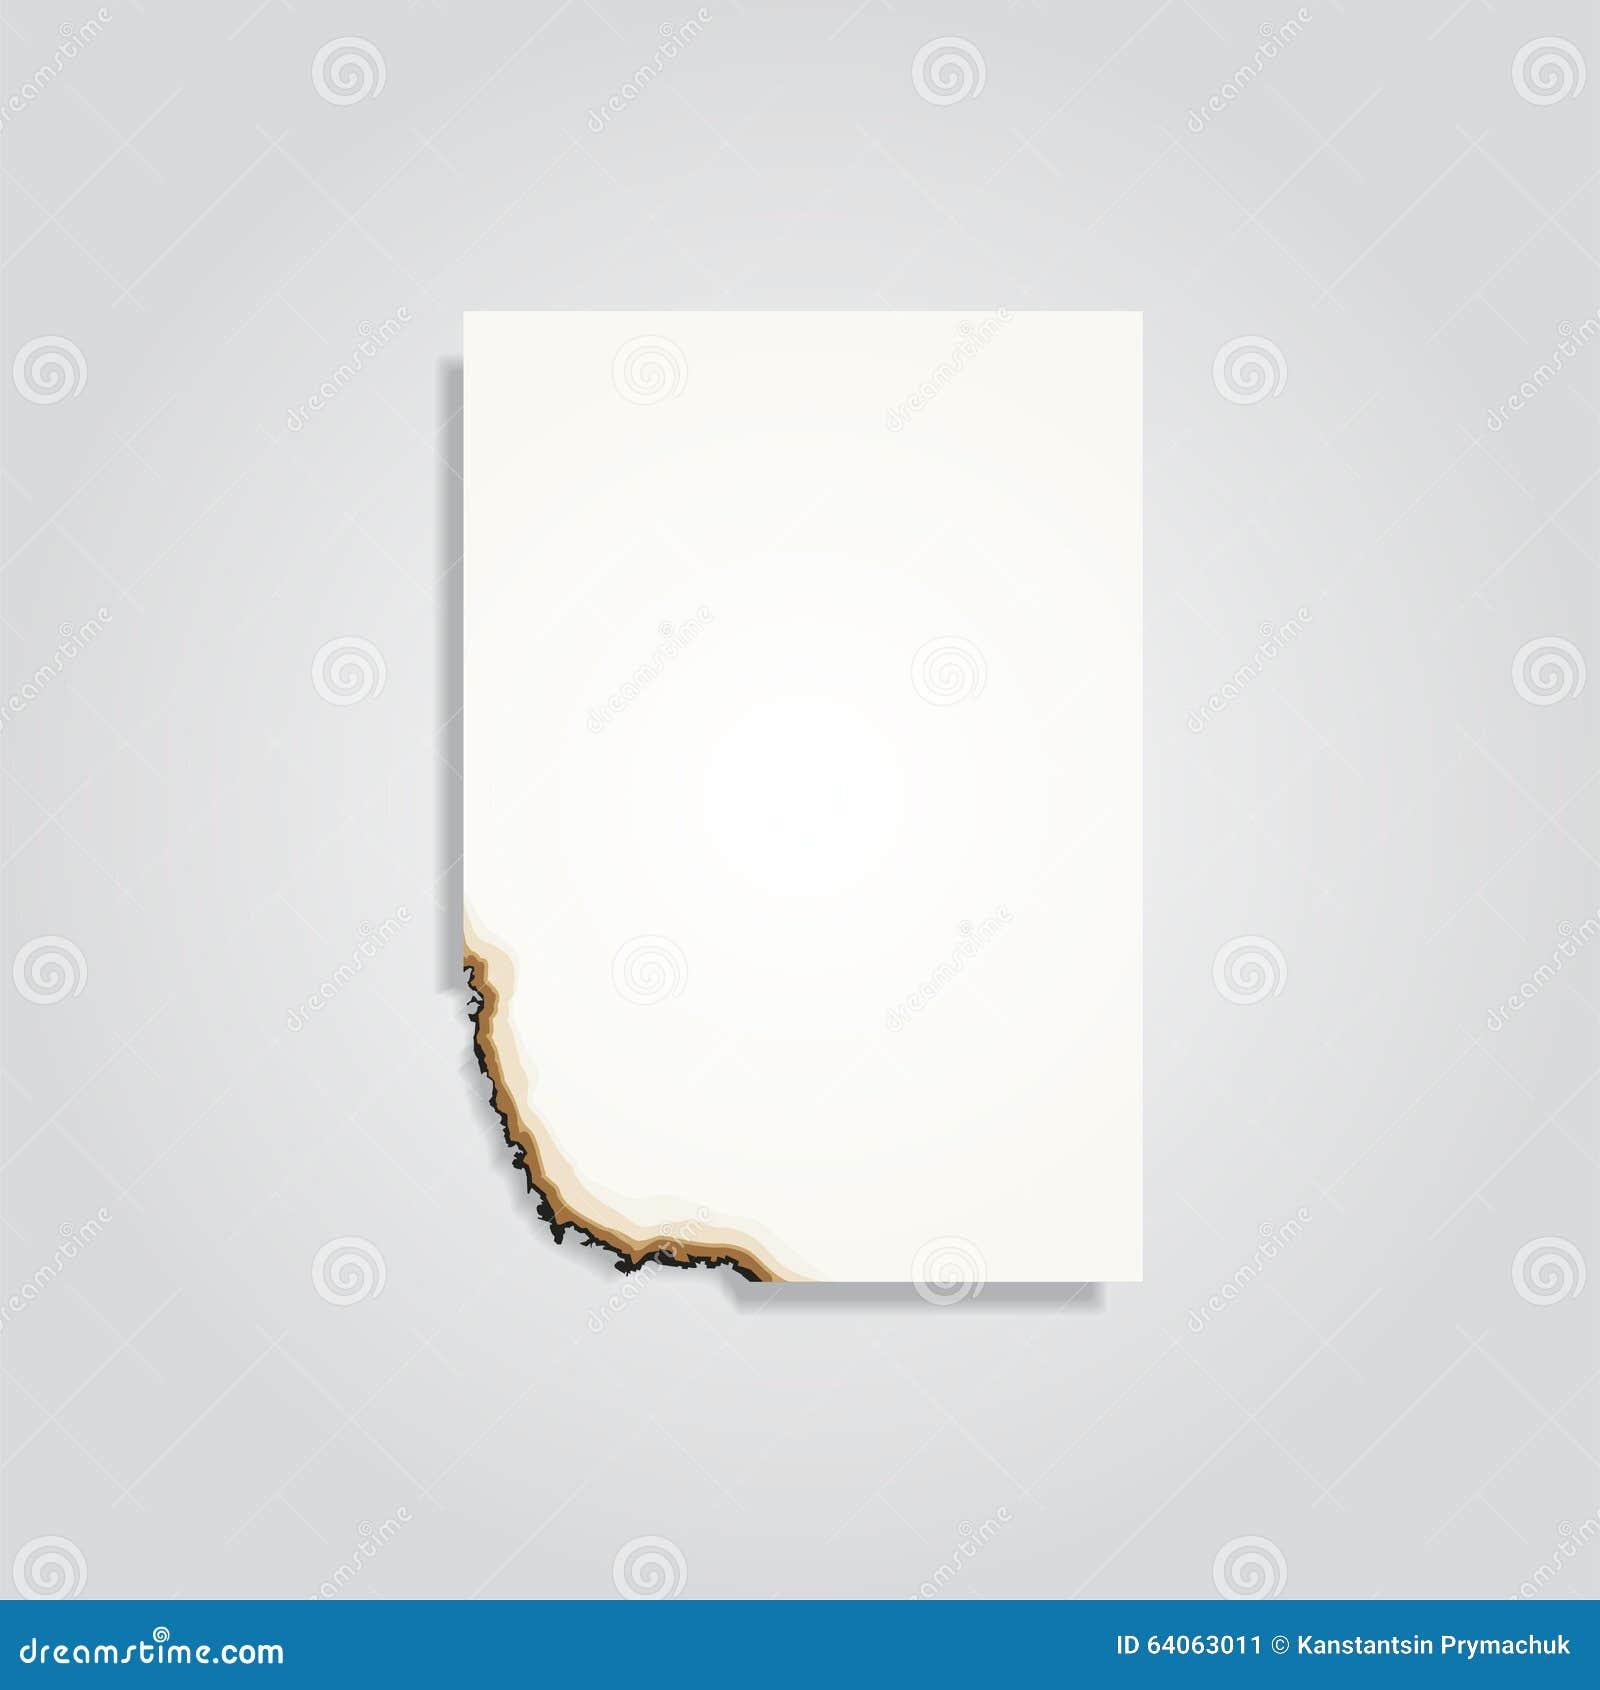 Paper Banner Template For Your Design Vector Illustration